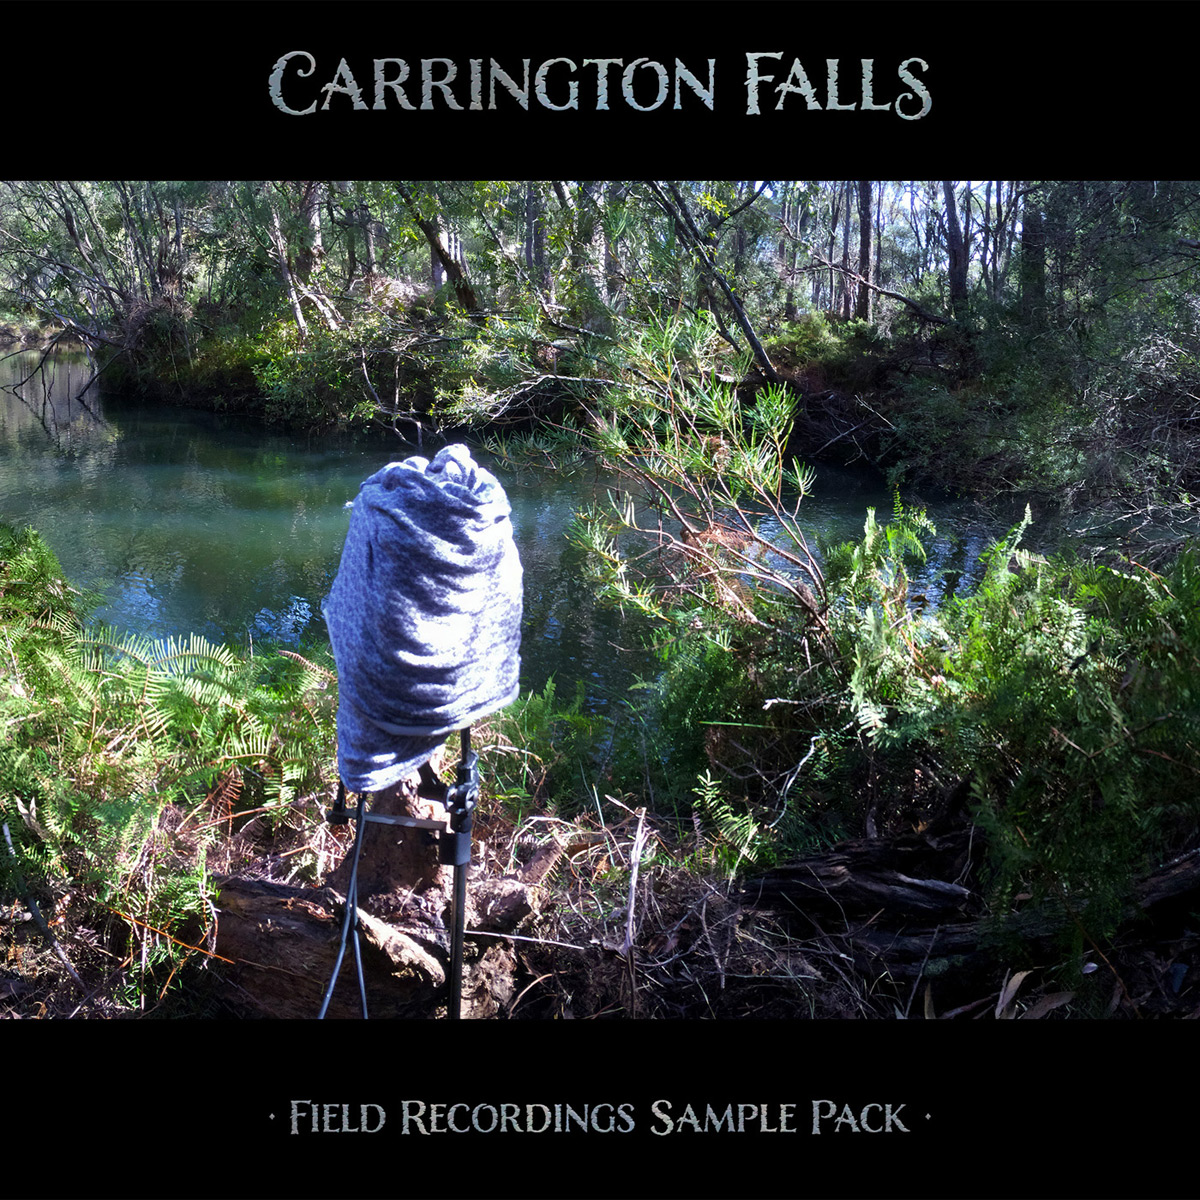 Carrington Falls Sample Pack – The Bishop of Balance